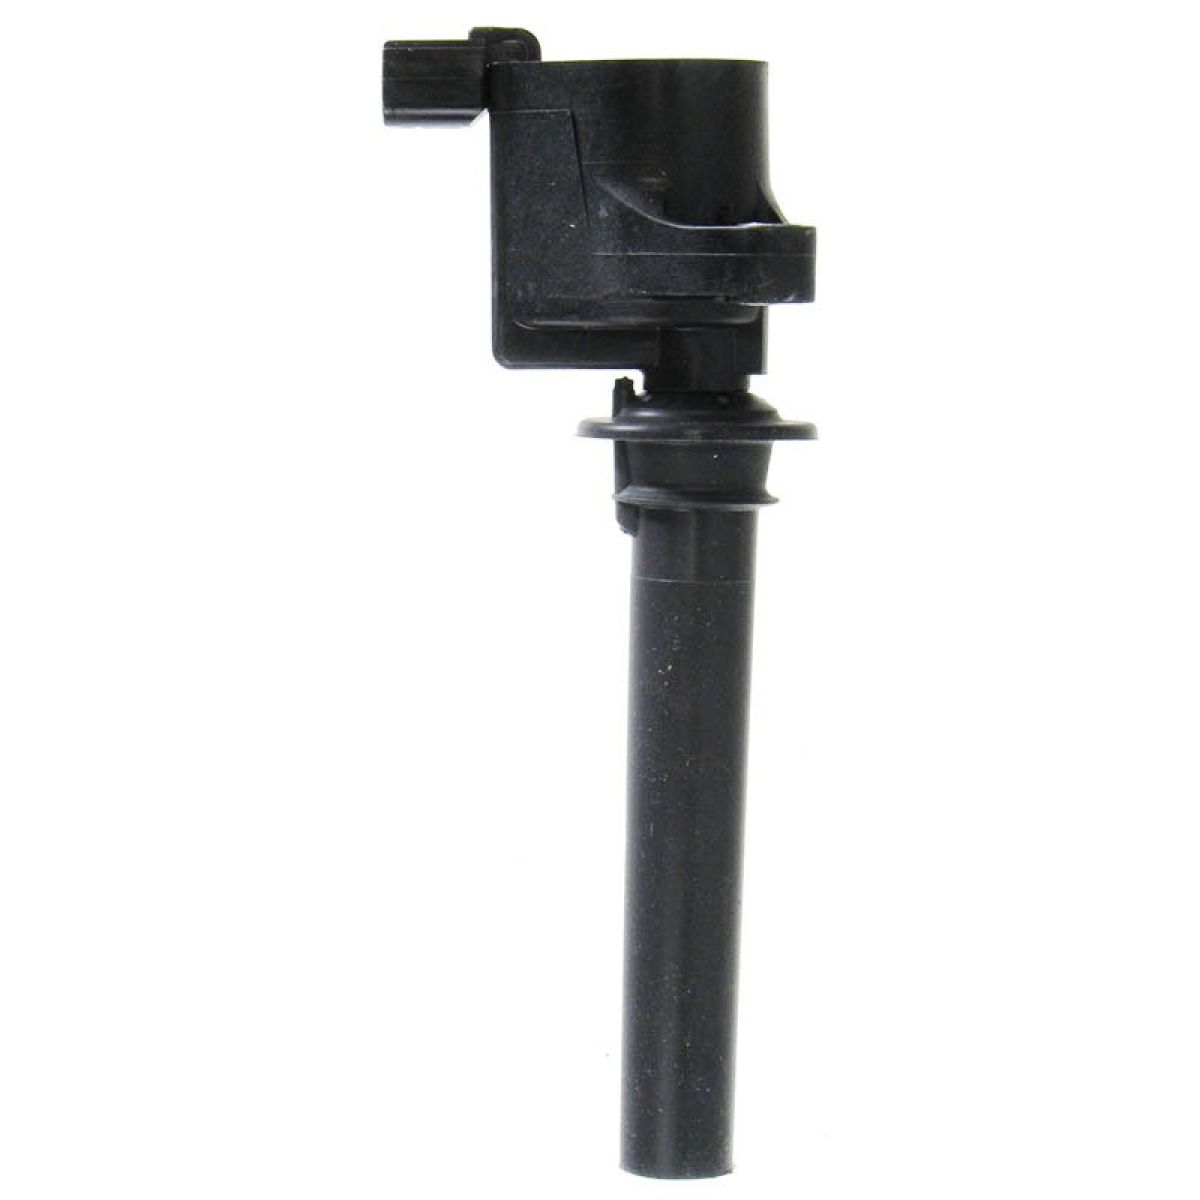 Motorcraft DG513 Ignition Coil